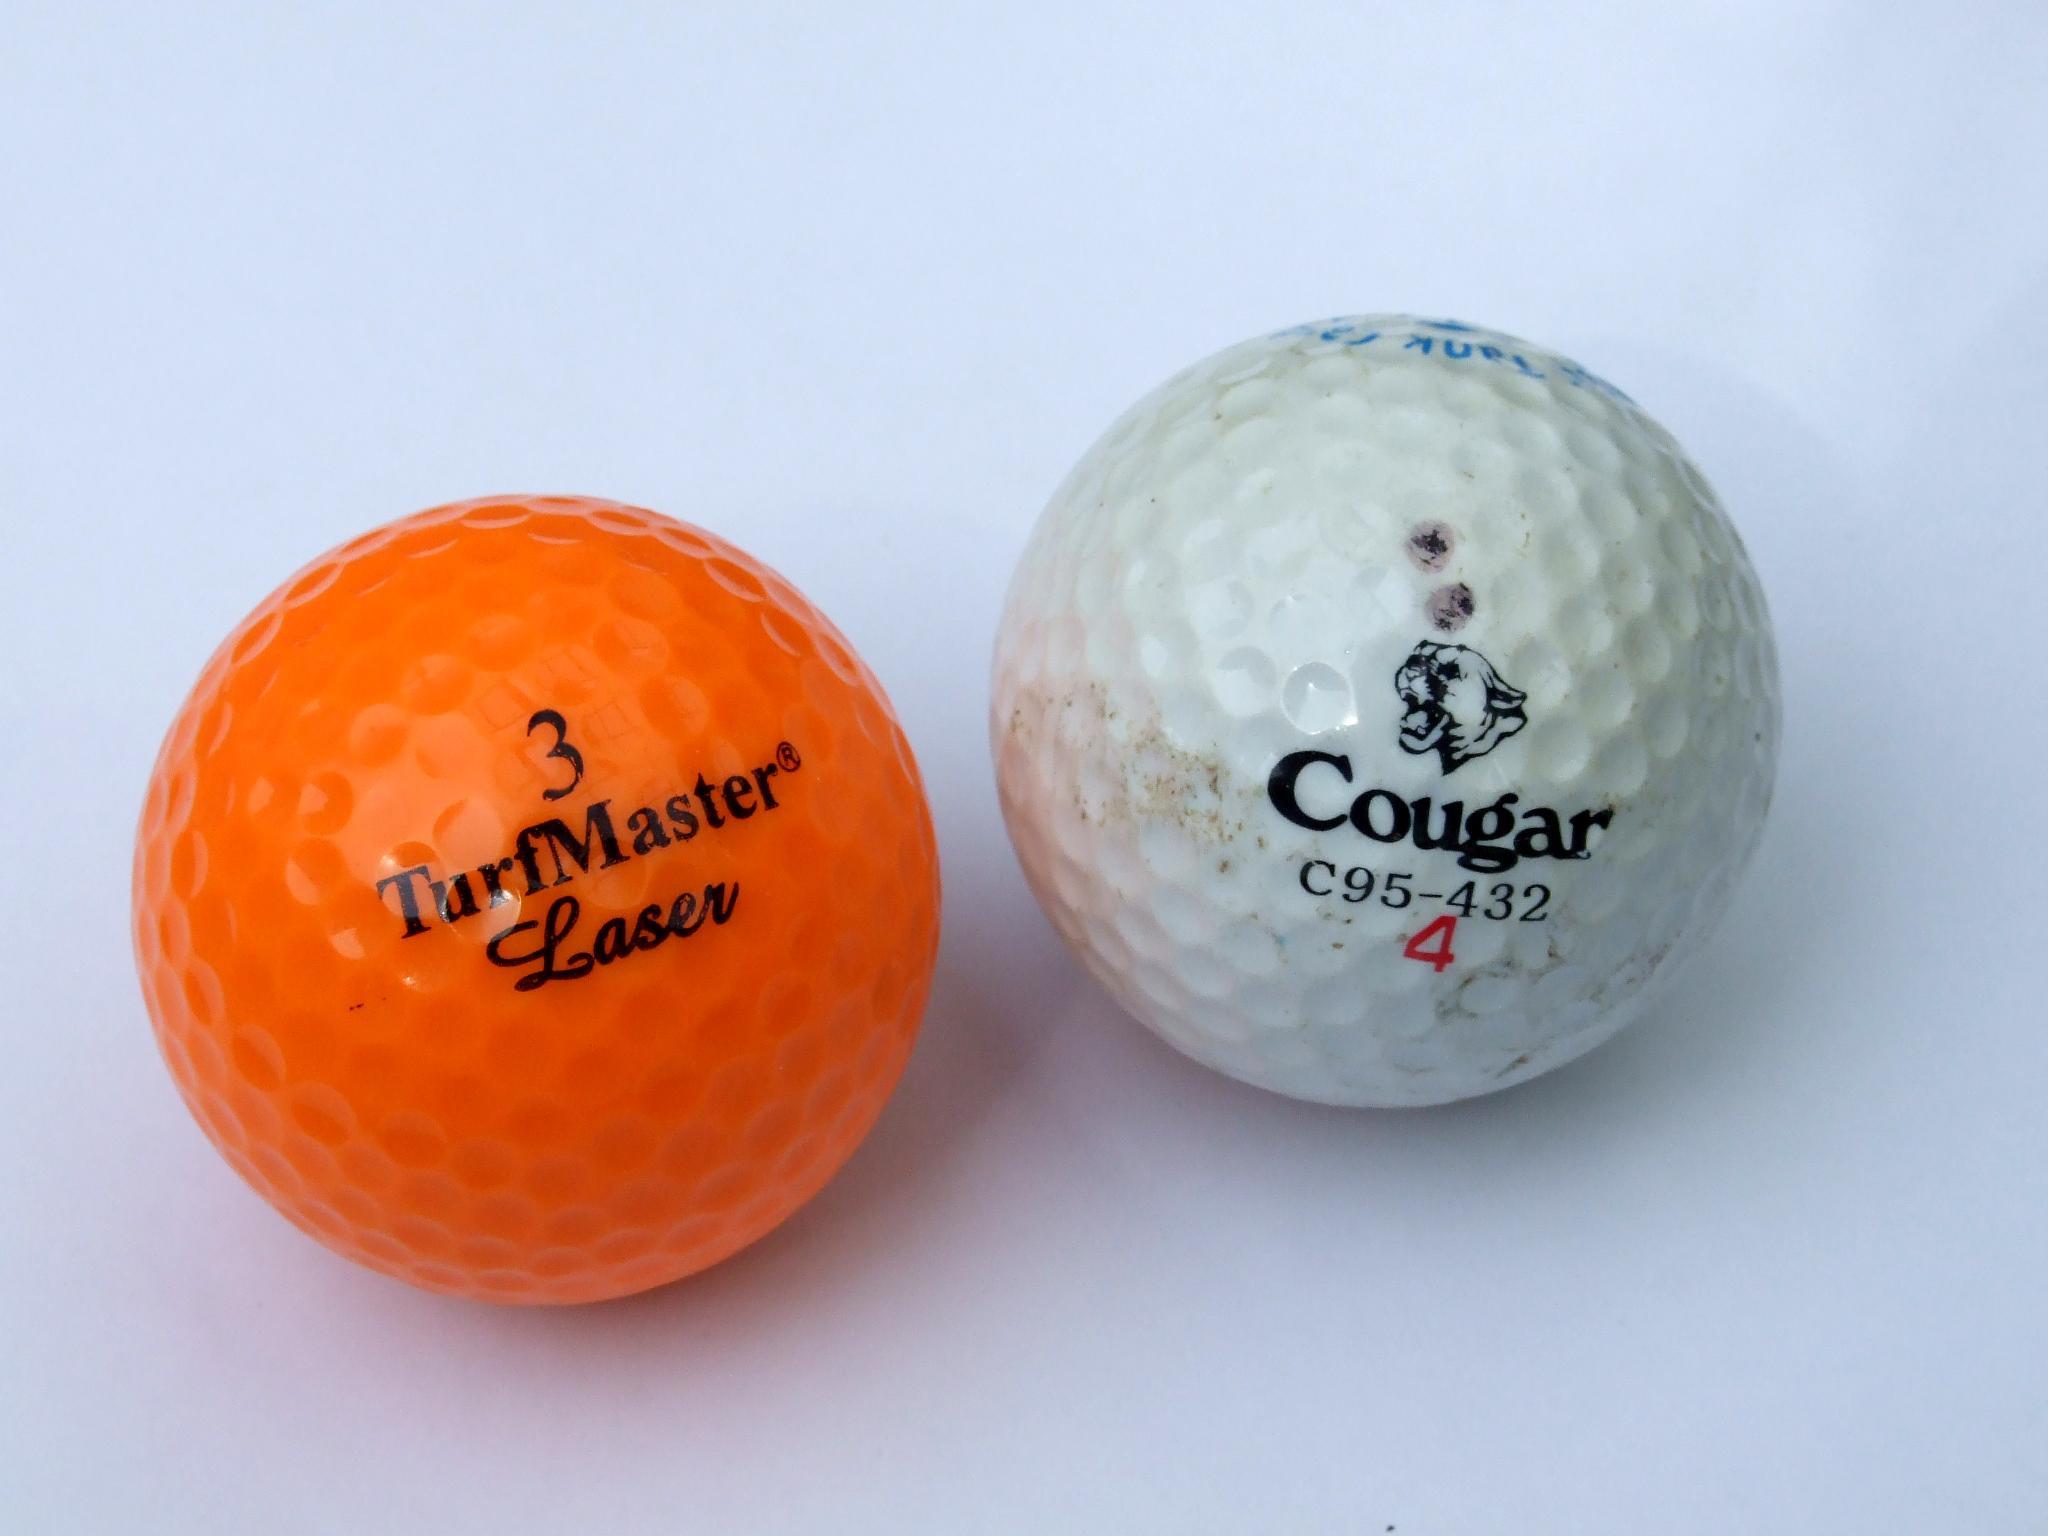 Golfer Besseling na matig slotweekend in de middenmoot